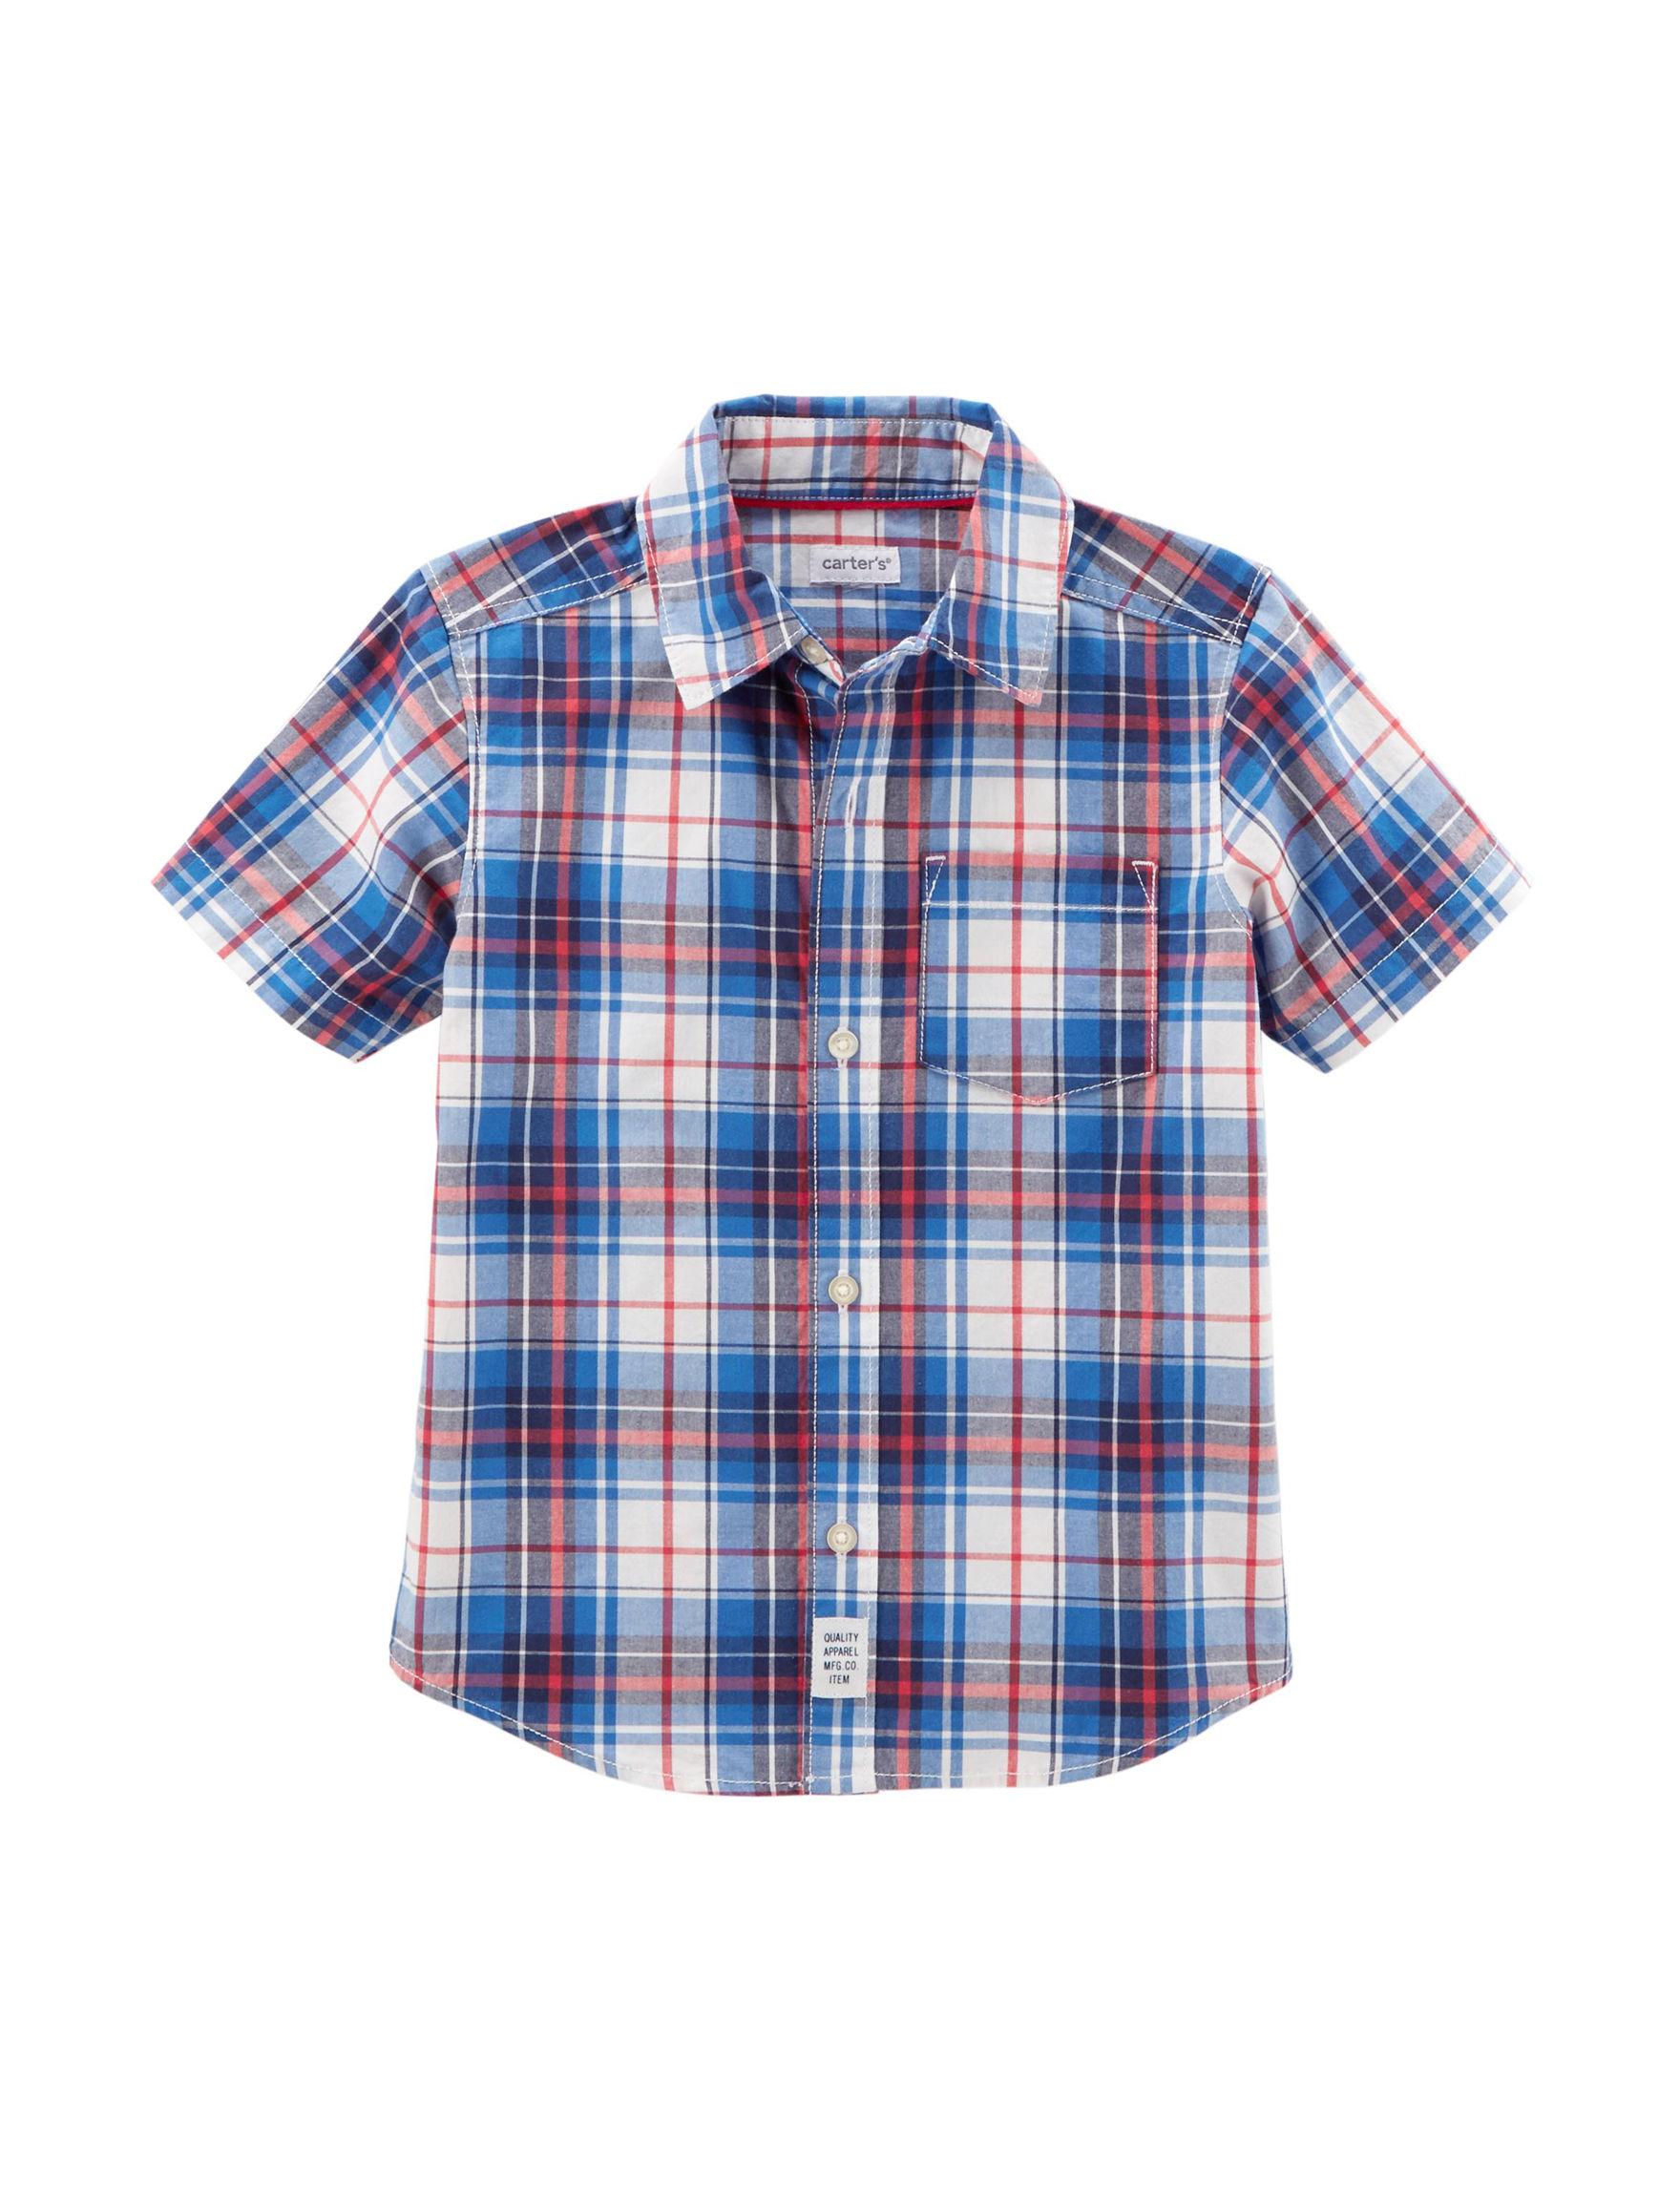 Carter's Blue Plaid Casual Button Down Shirts